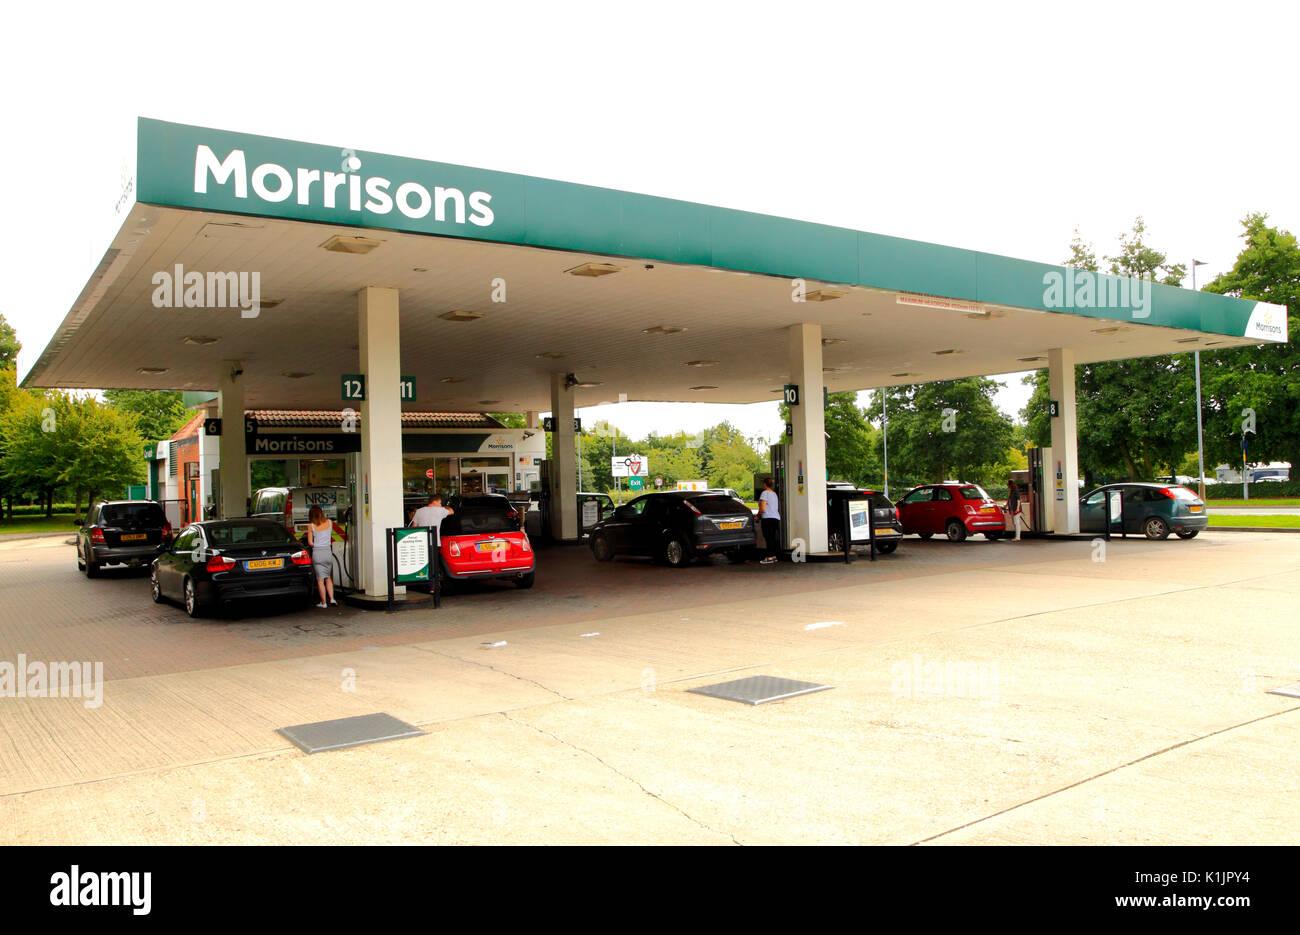 Morrisons,  petrol, diesel, filling station, supermarket, Fakenham, Norfolk, England, UK - Stock Image